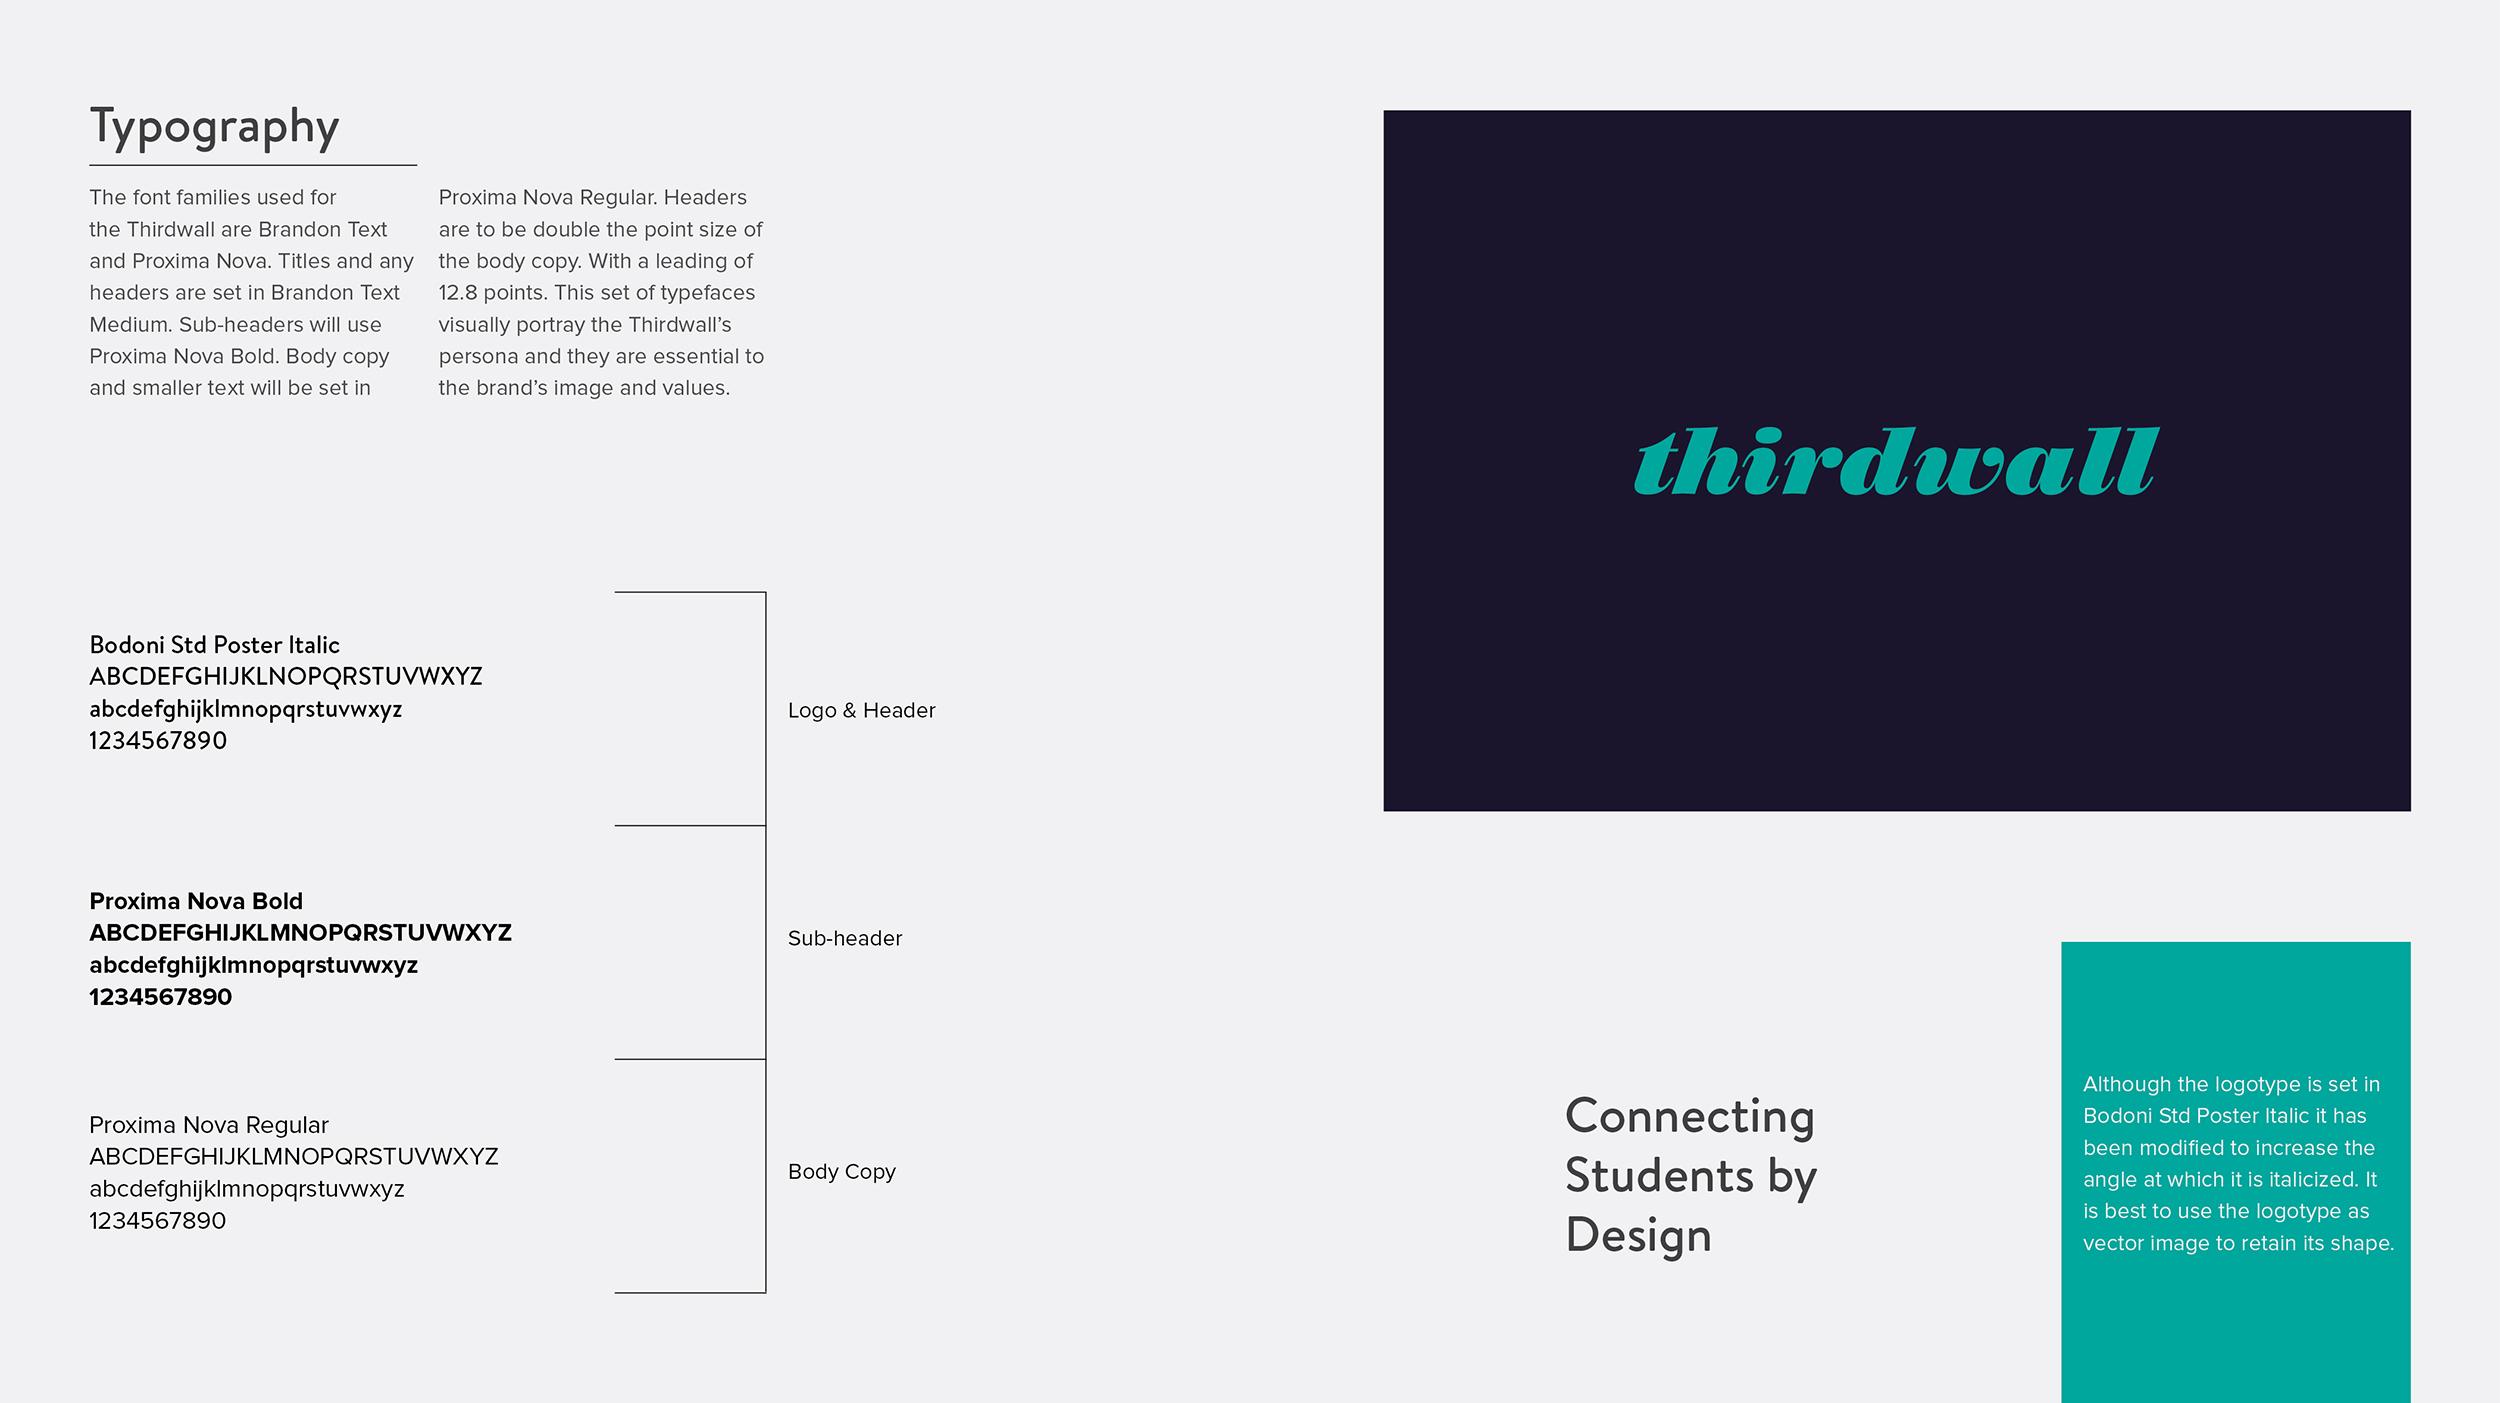 thirdwall_typograpghy.jpg